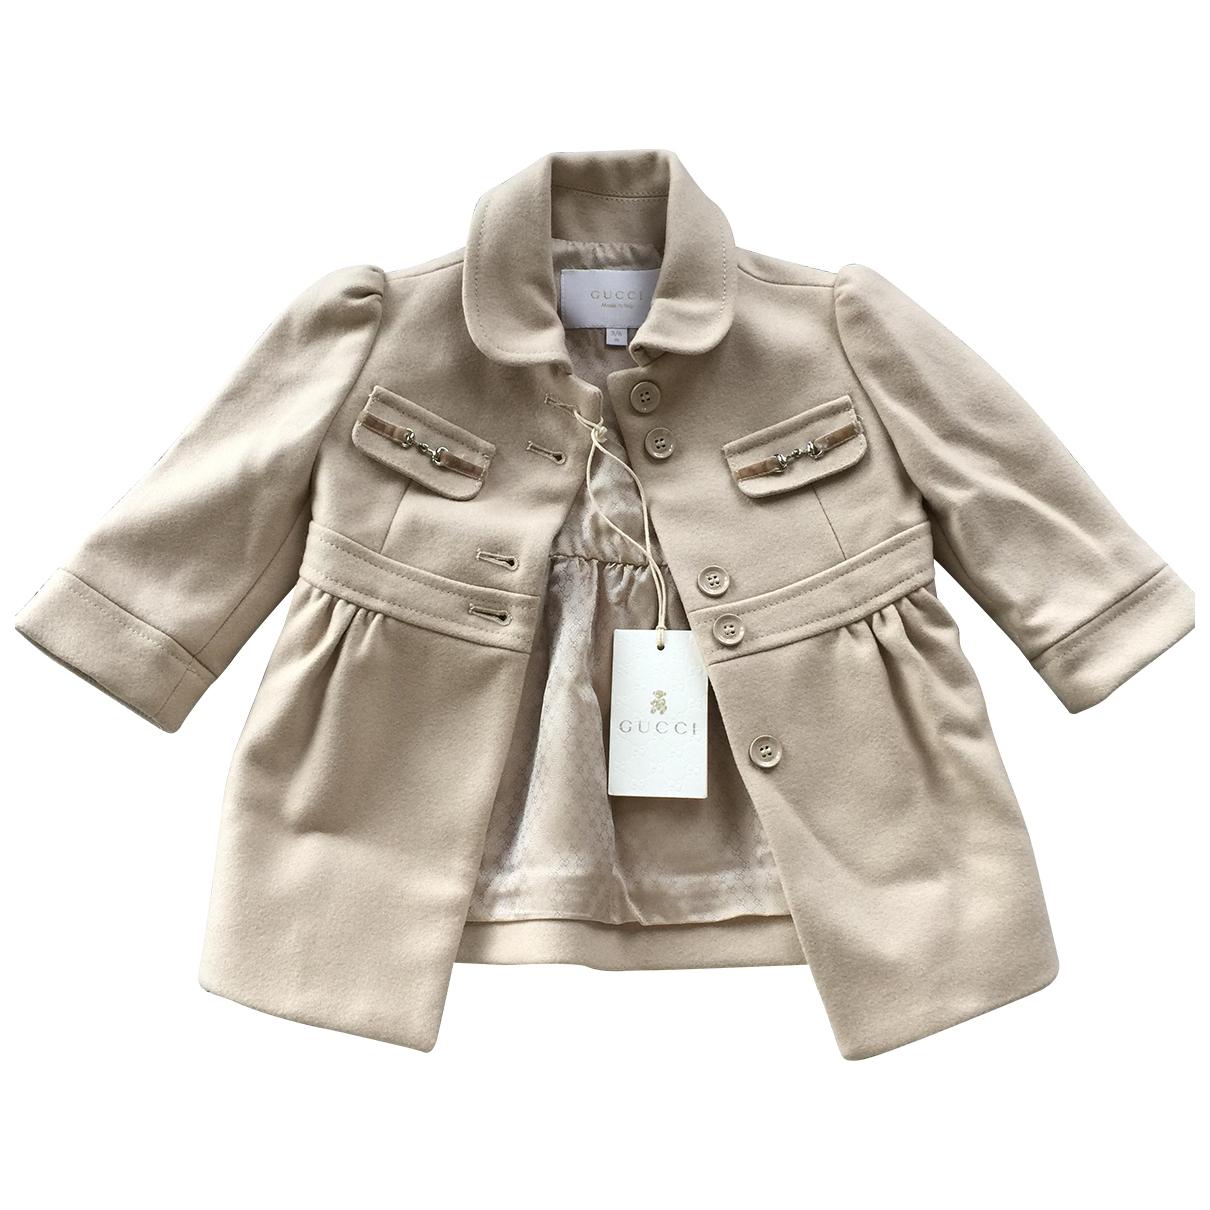 Gucci \N Beige Wool jacket & coat for Kids 3 months - up to 60cm FR